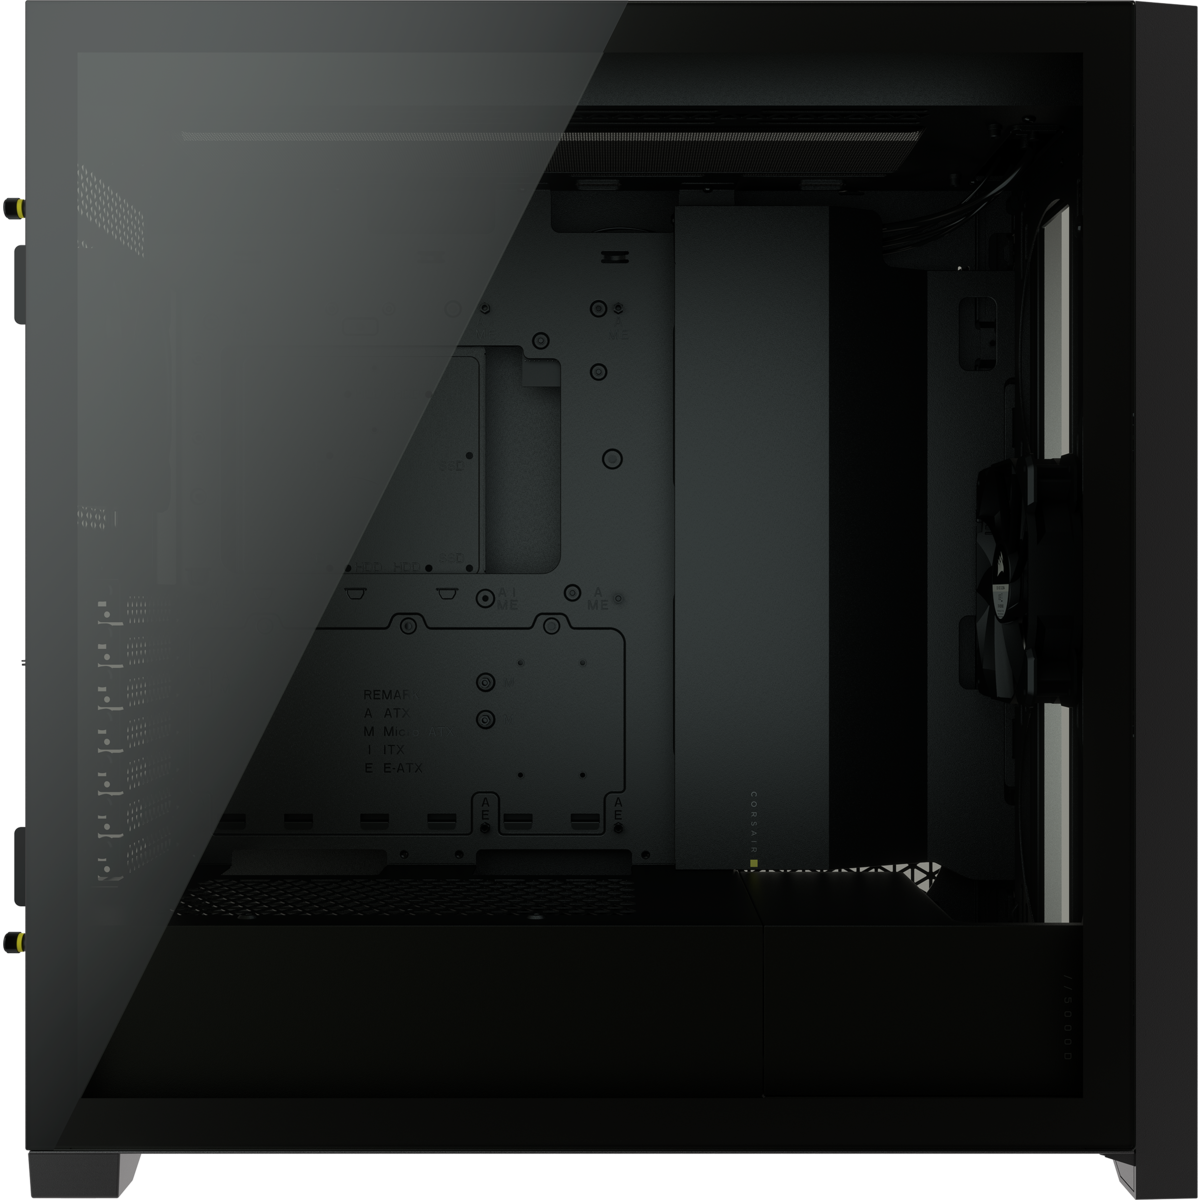 base-5000d-gallery-5000d-black-12